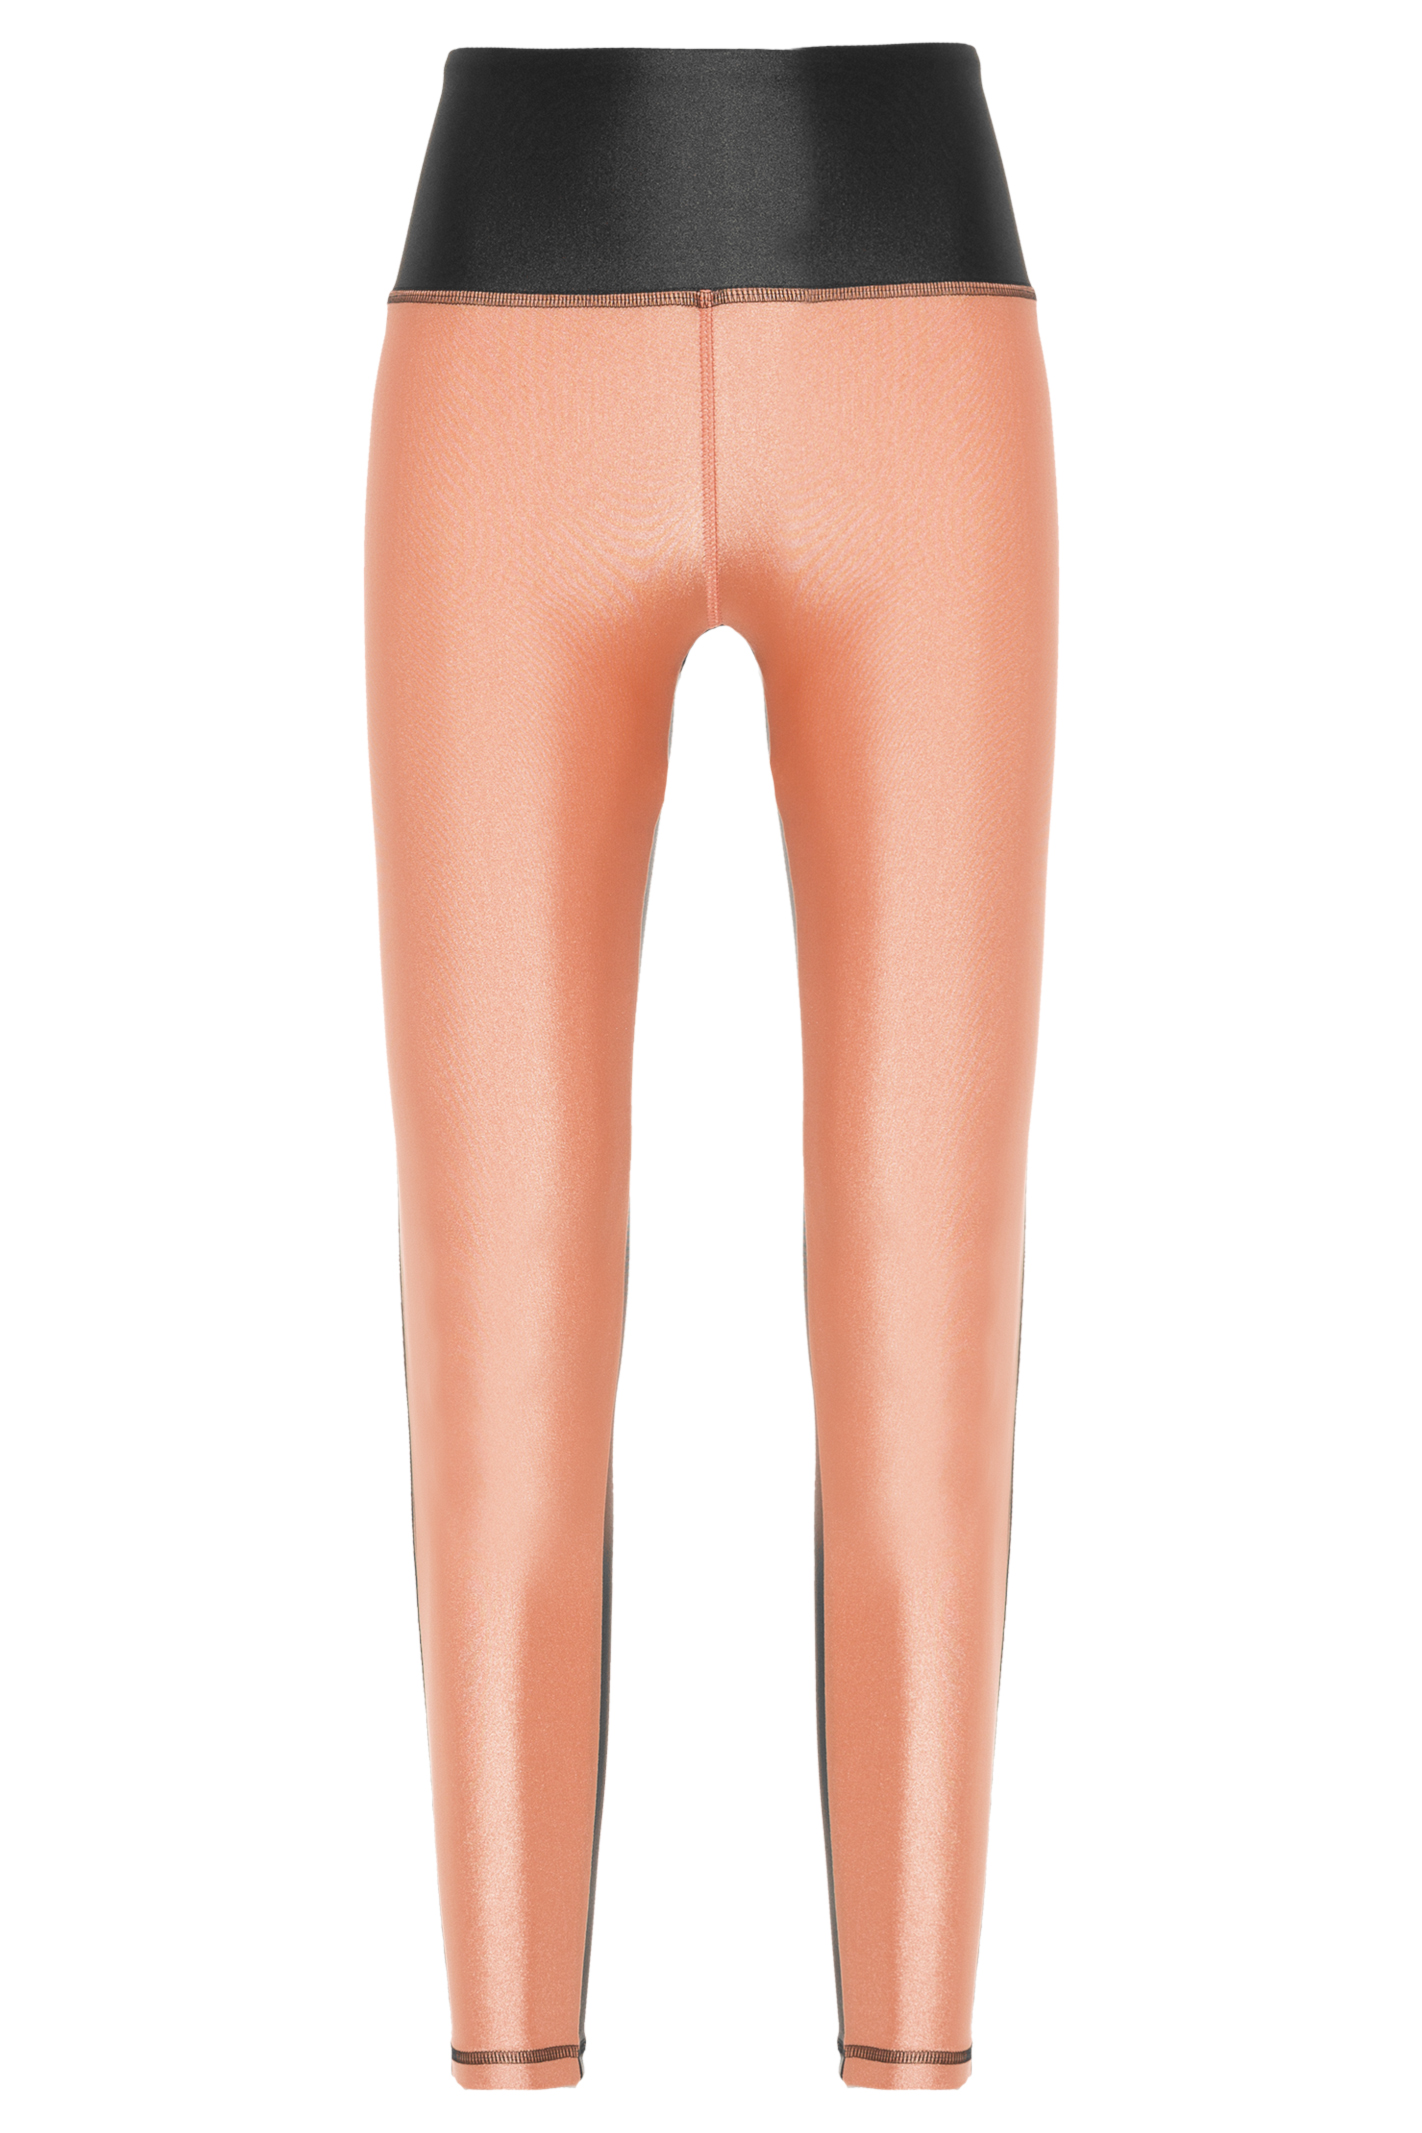 Wf1611 Legging Elegance Preto/ Ouro Rosa